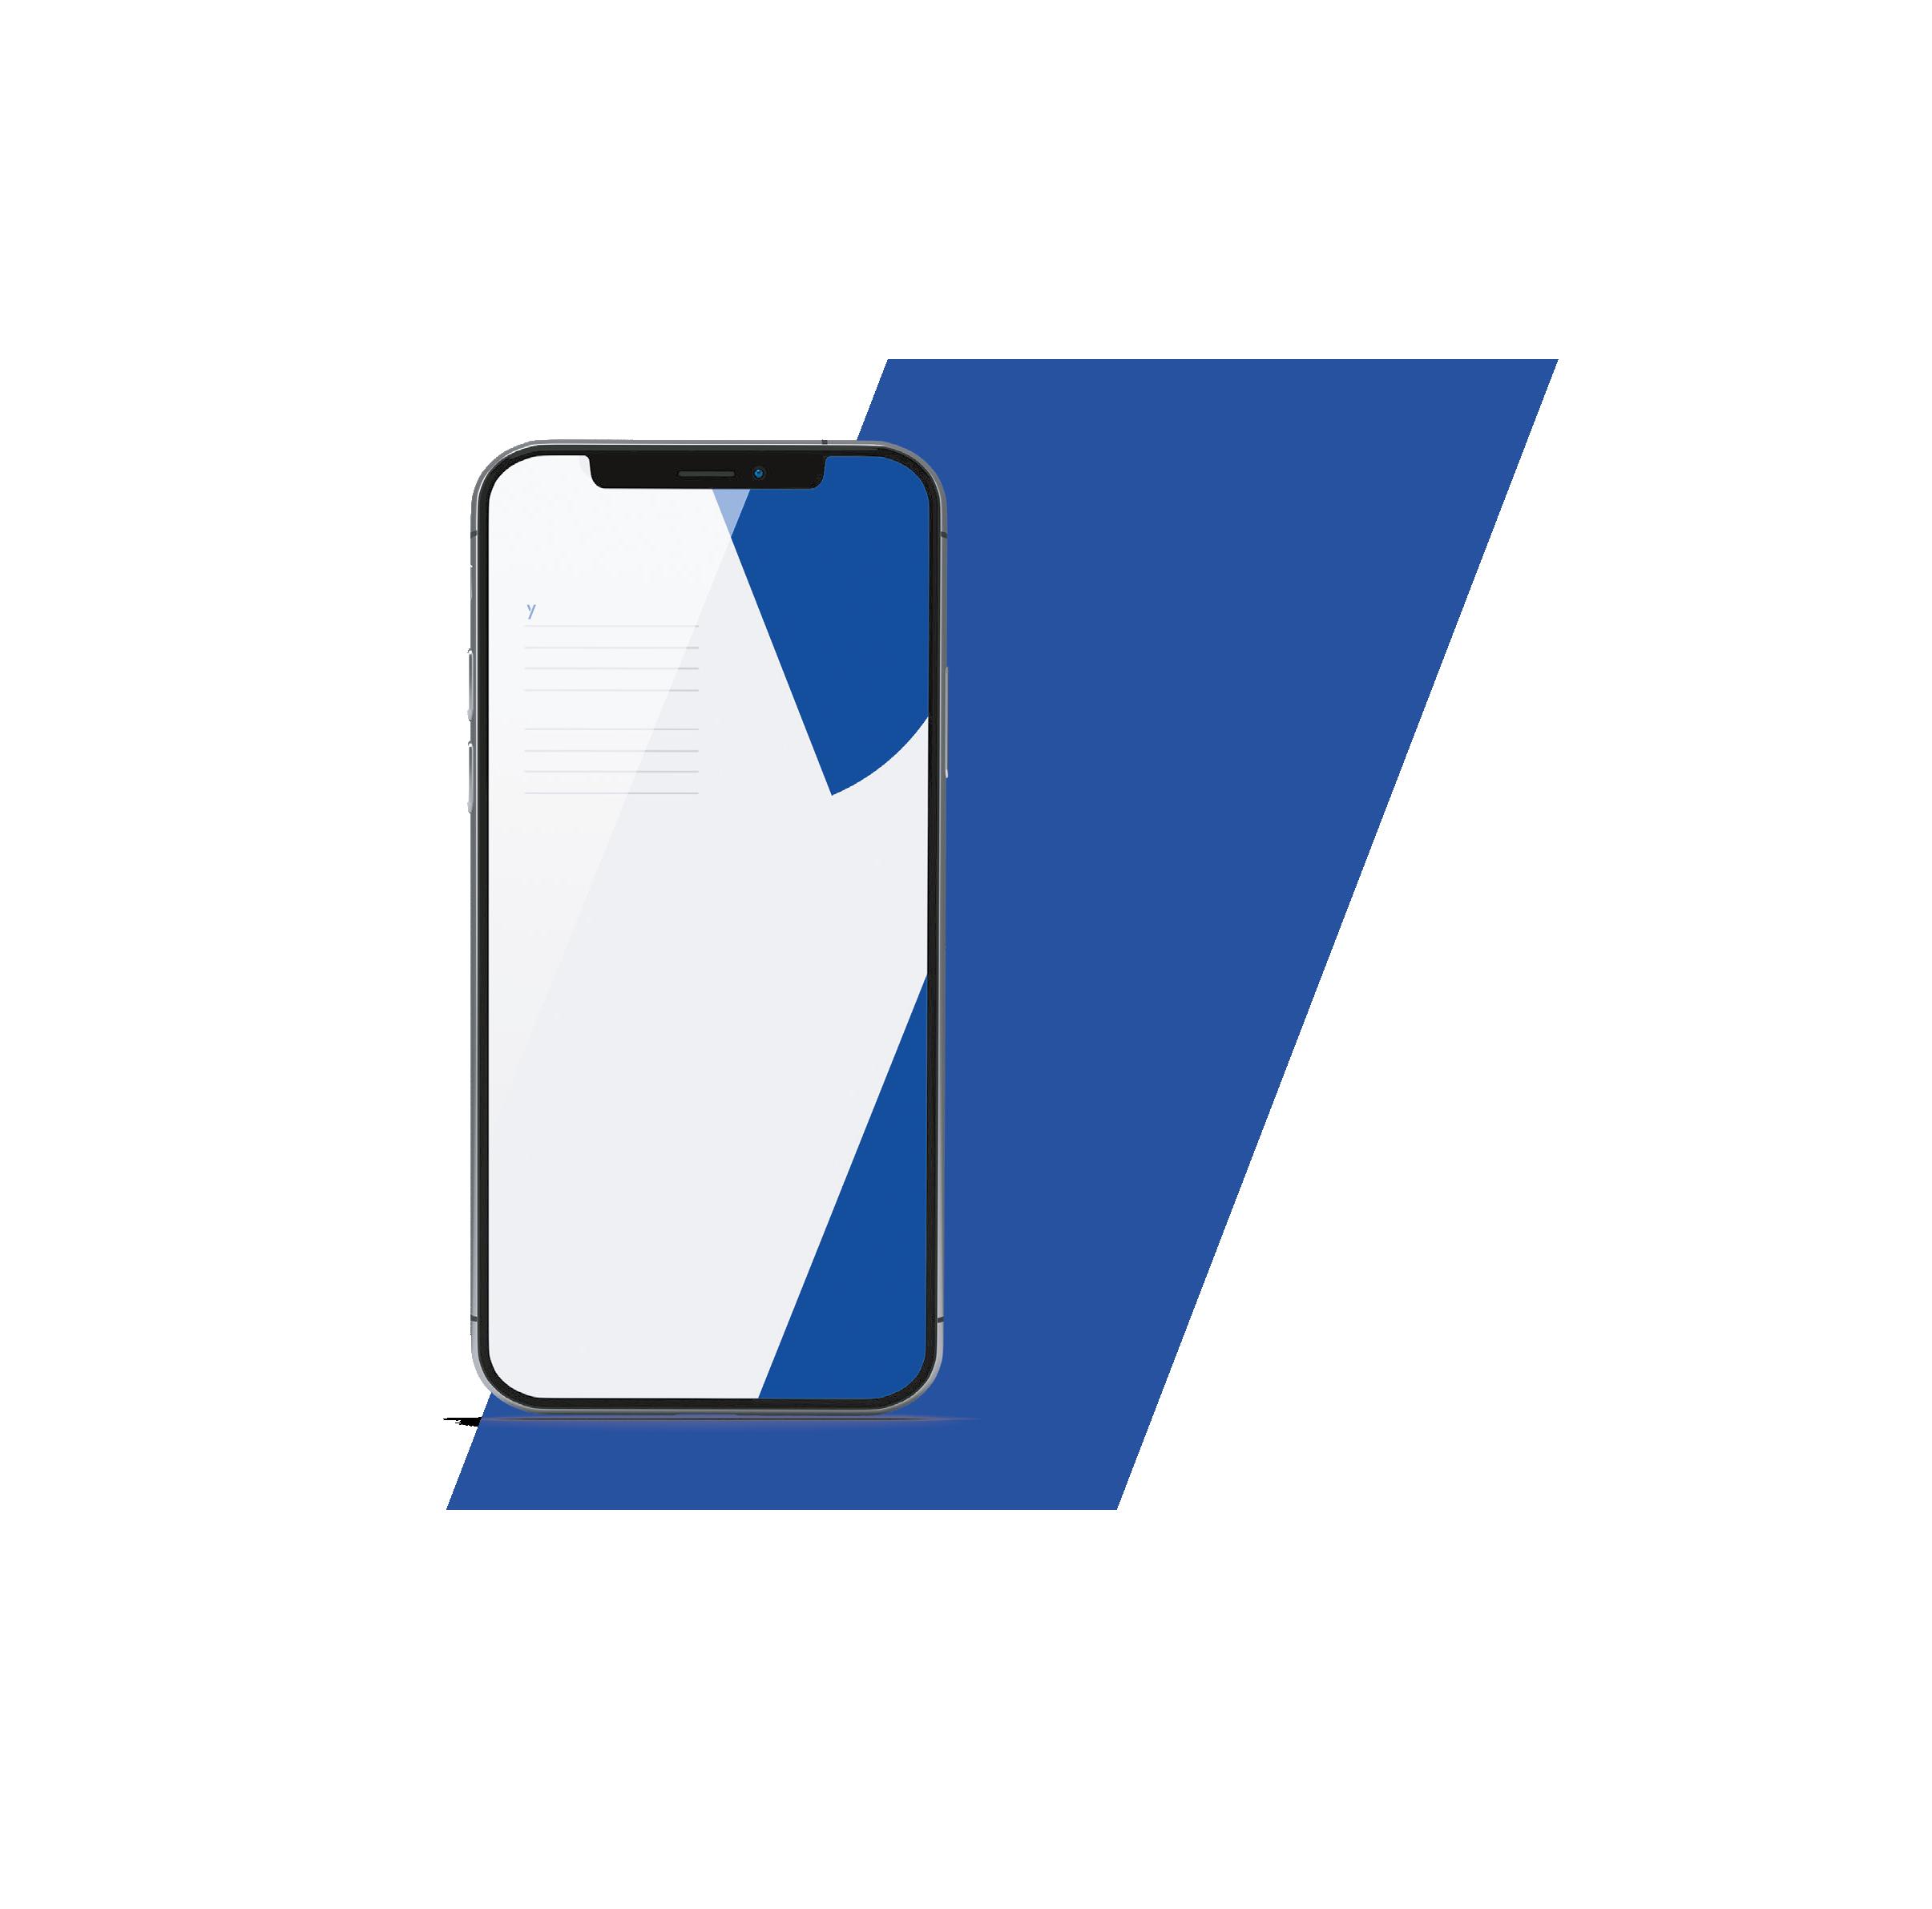 Ynov Web Management